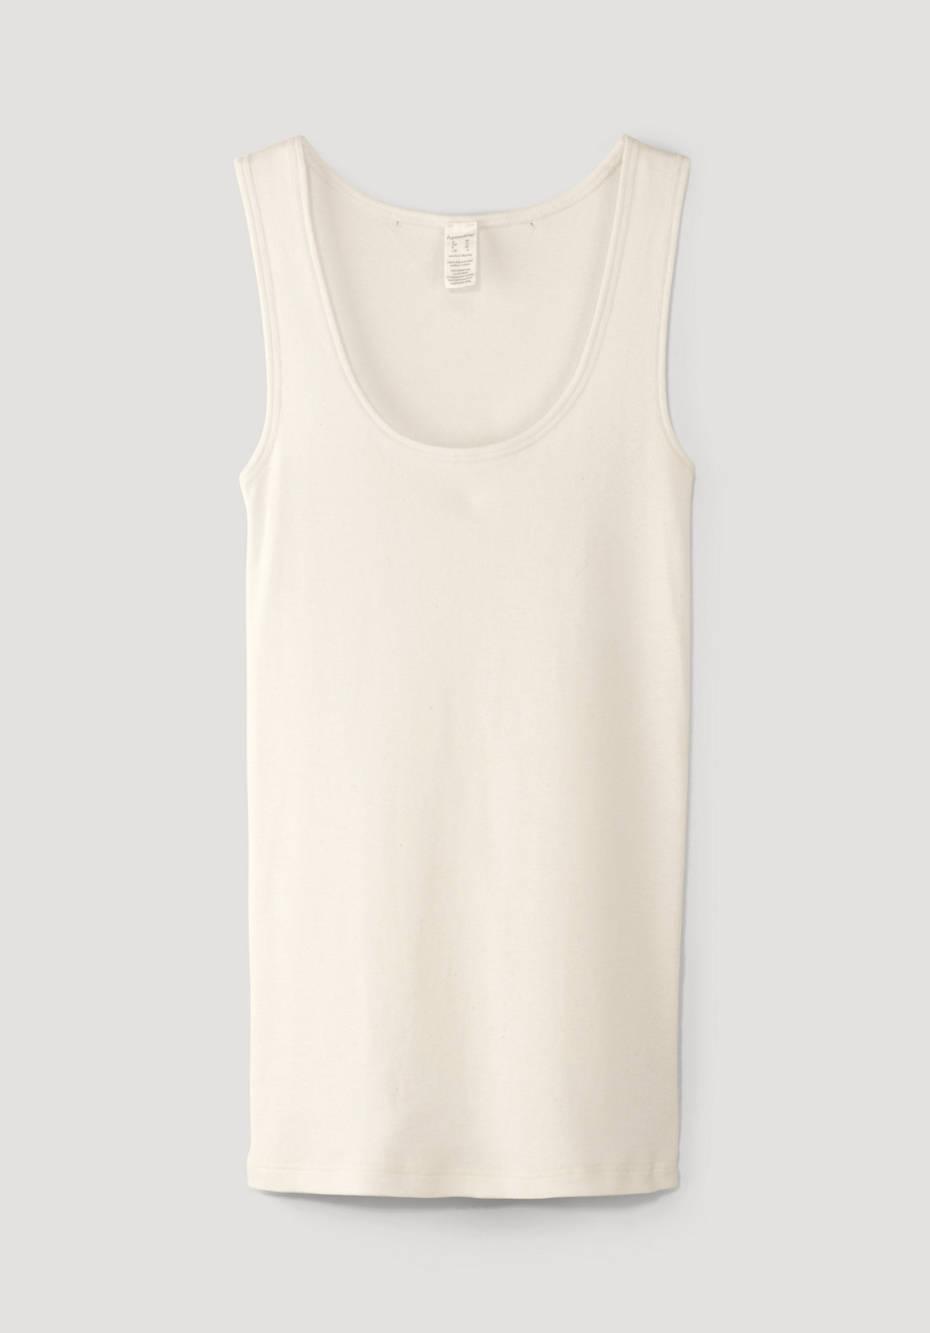 Tank shirt ModernNATURE made of pure organic cotton